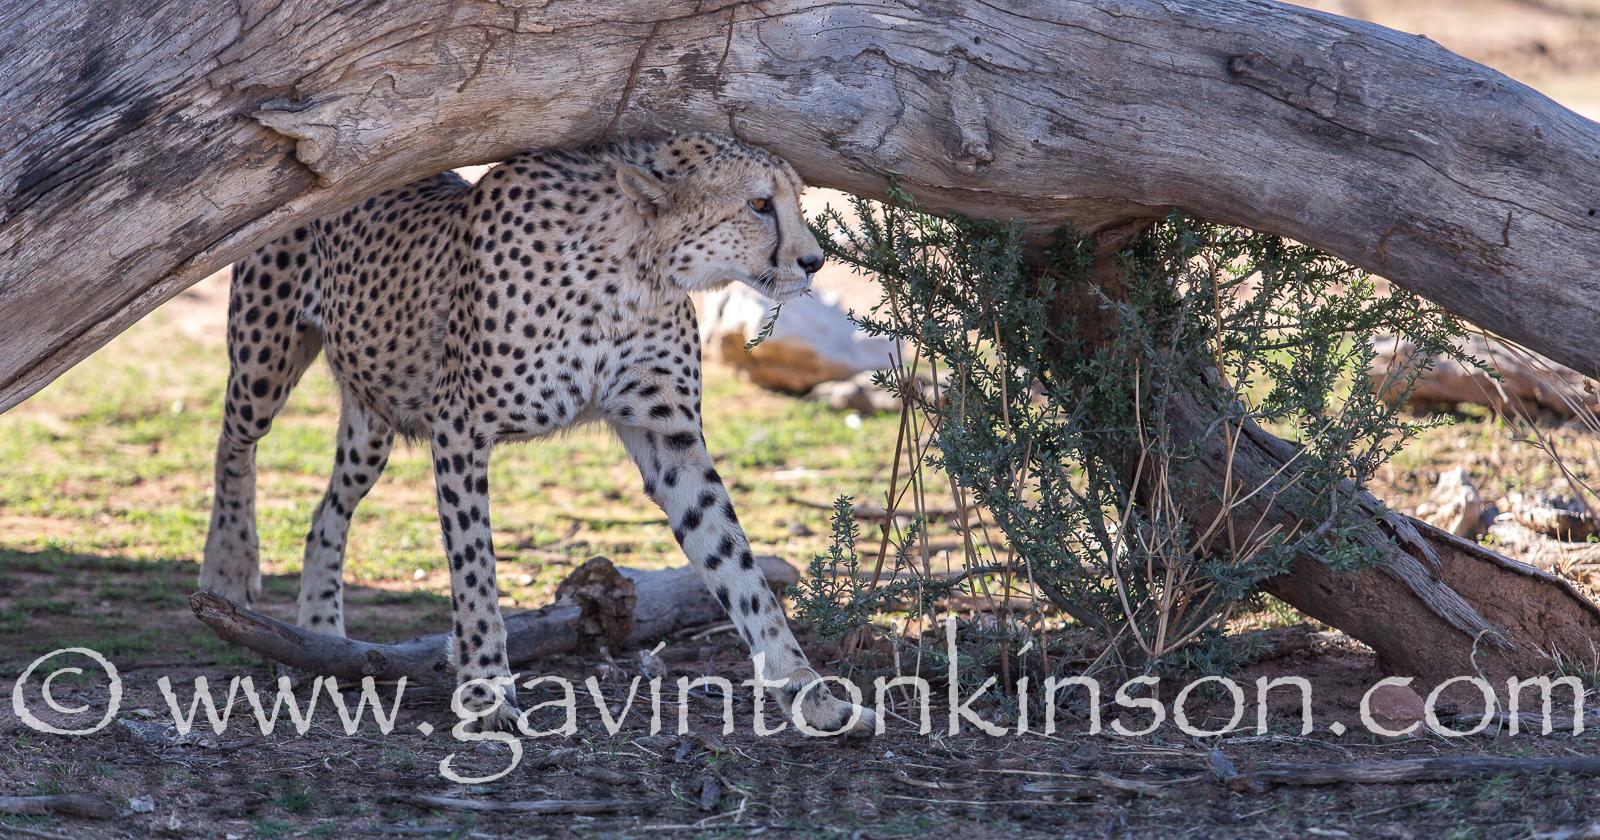 Scenting cheetah 2